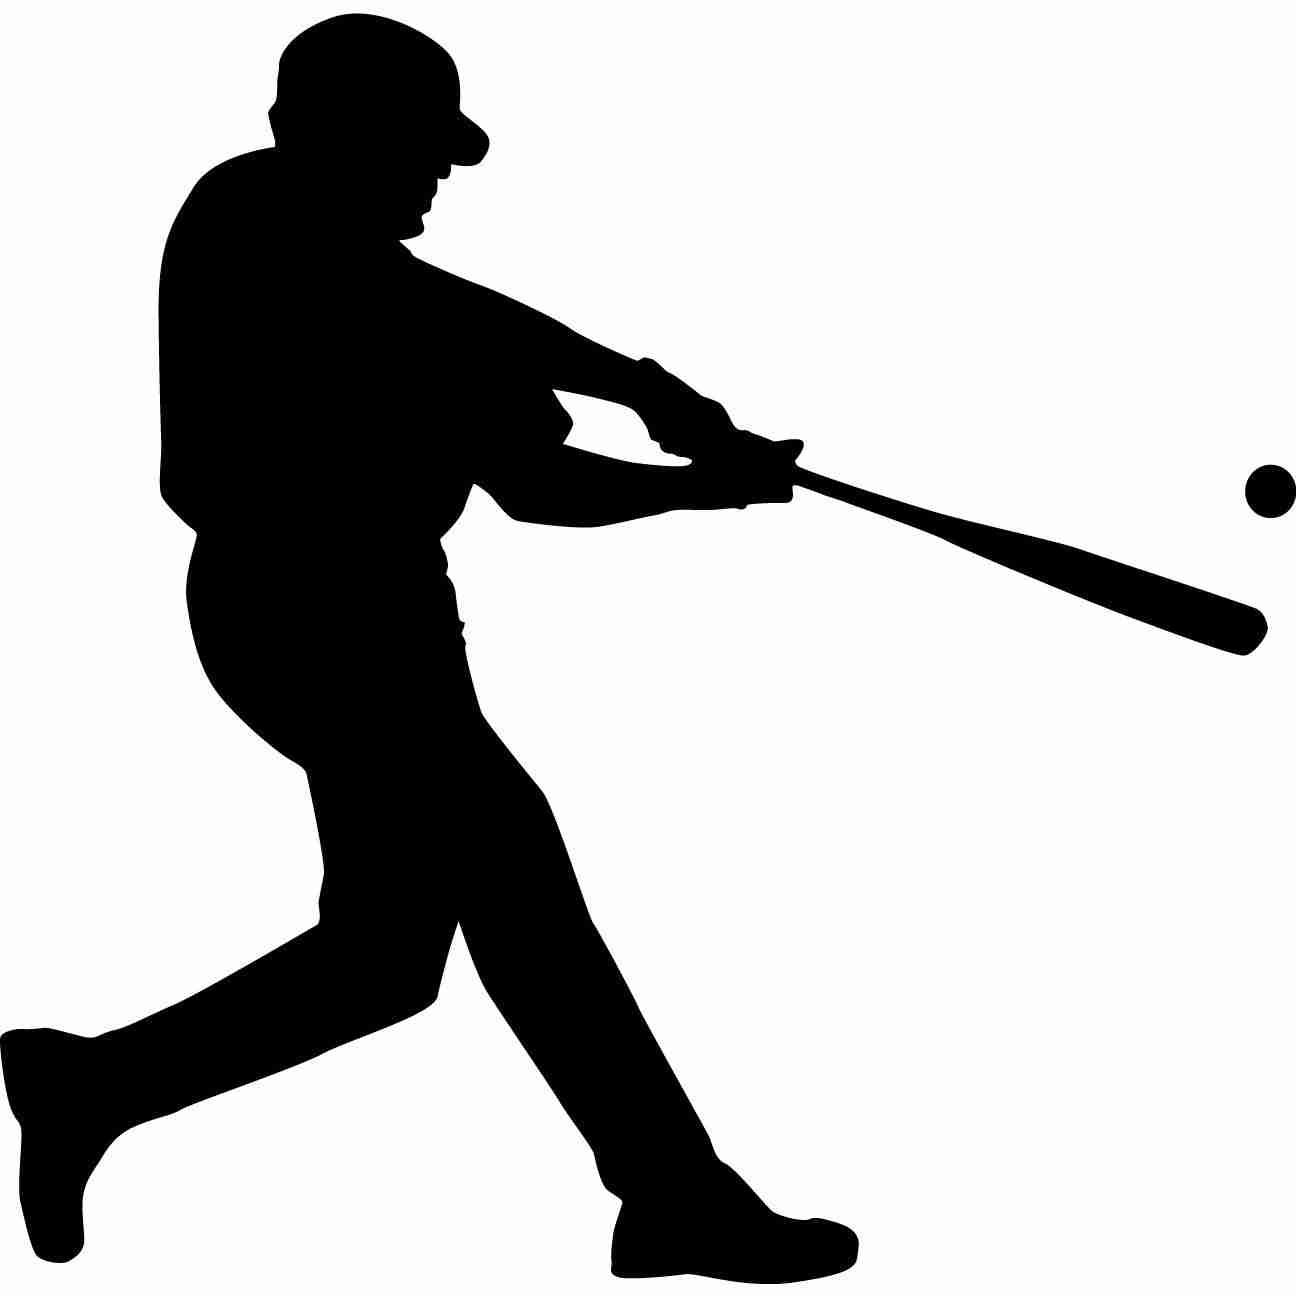 1296x1296 Baseball Silhouette Silhouettes Cool Player Olegratiy